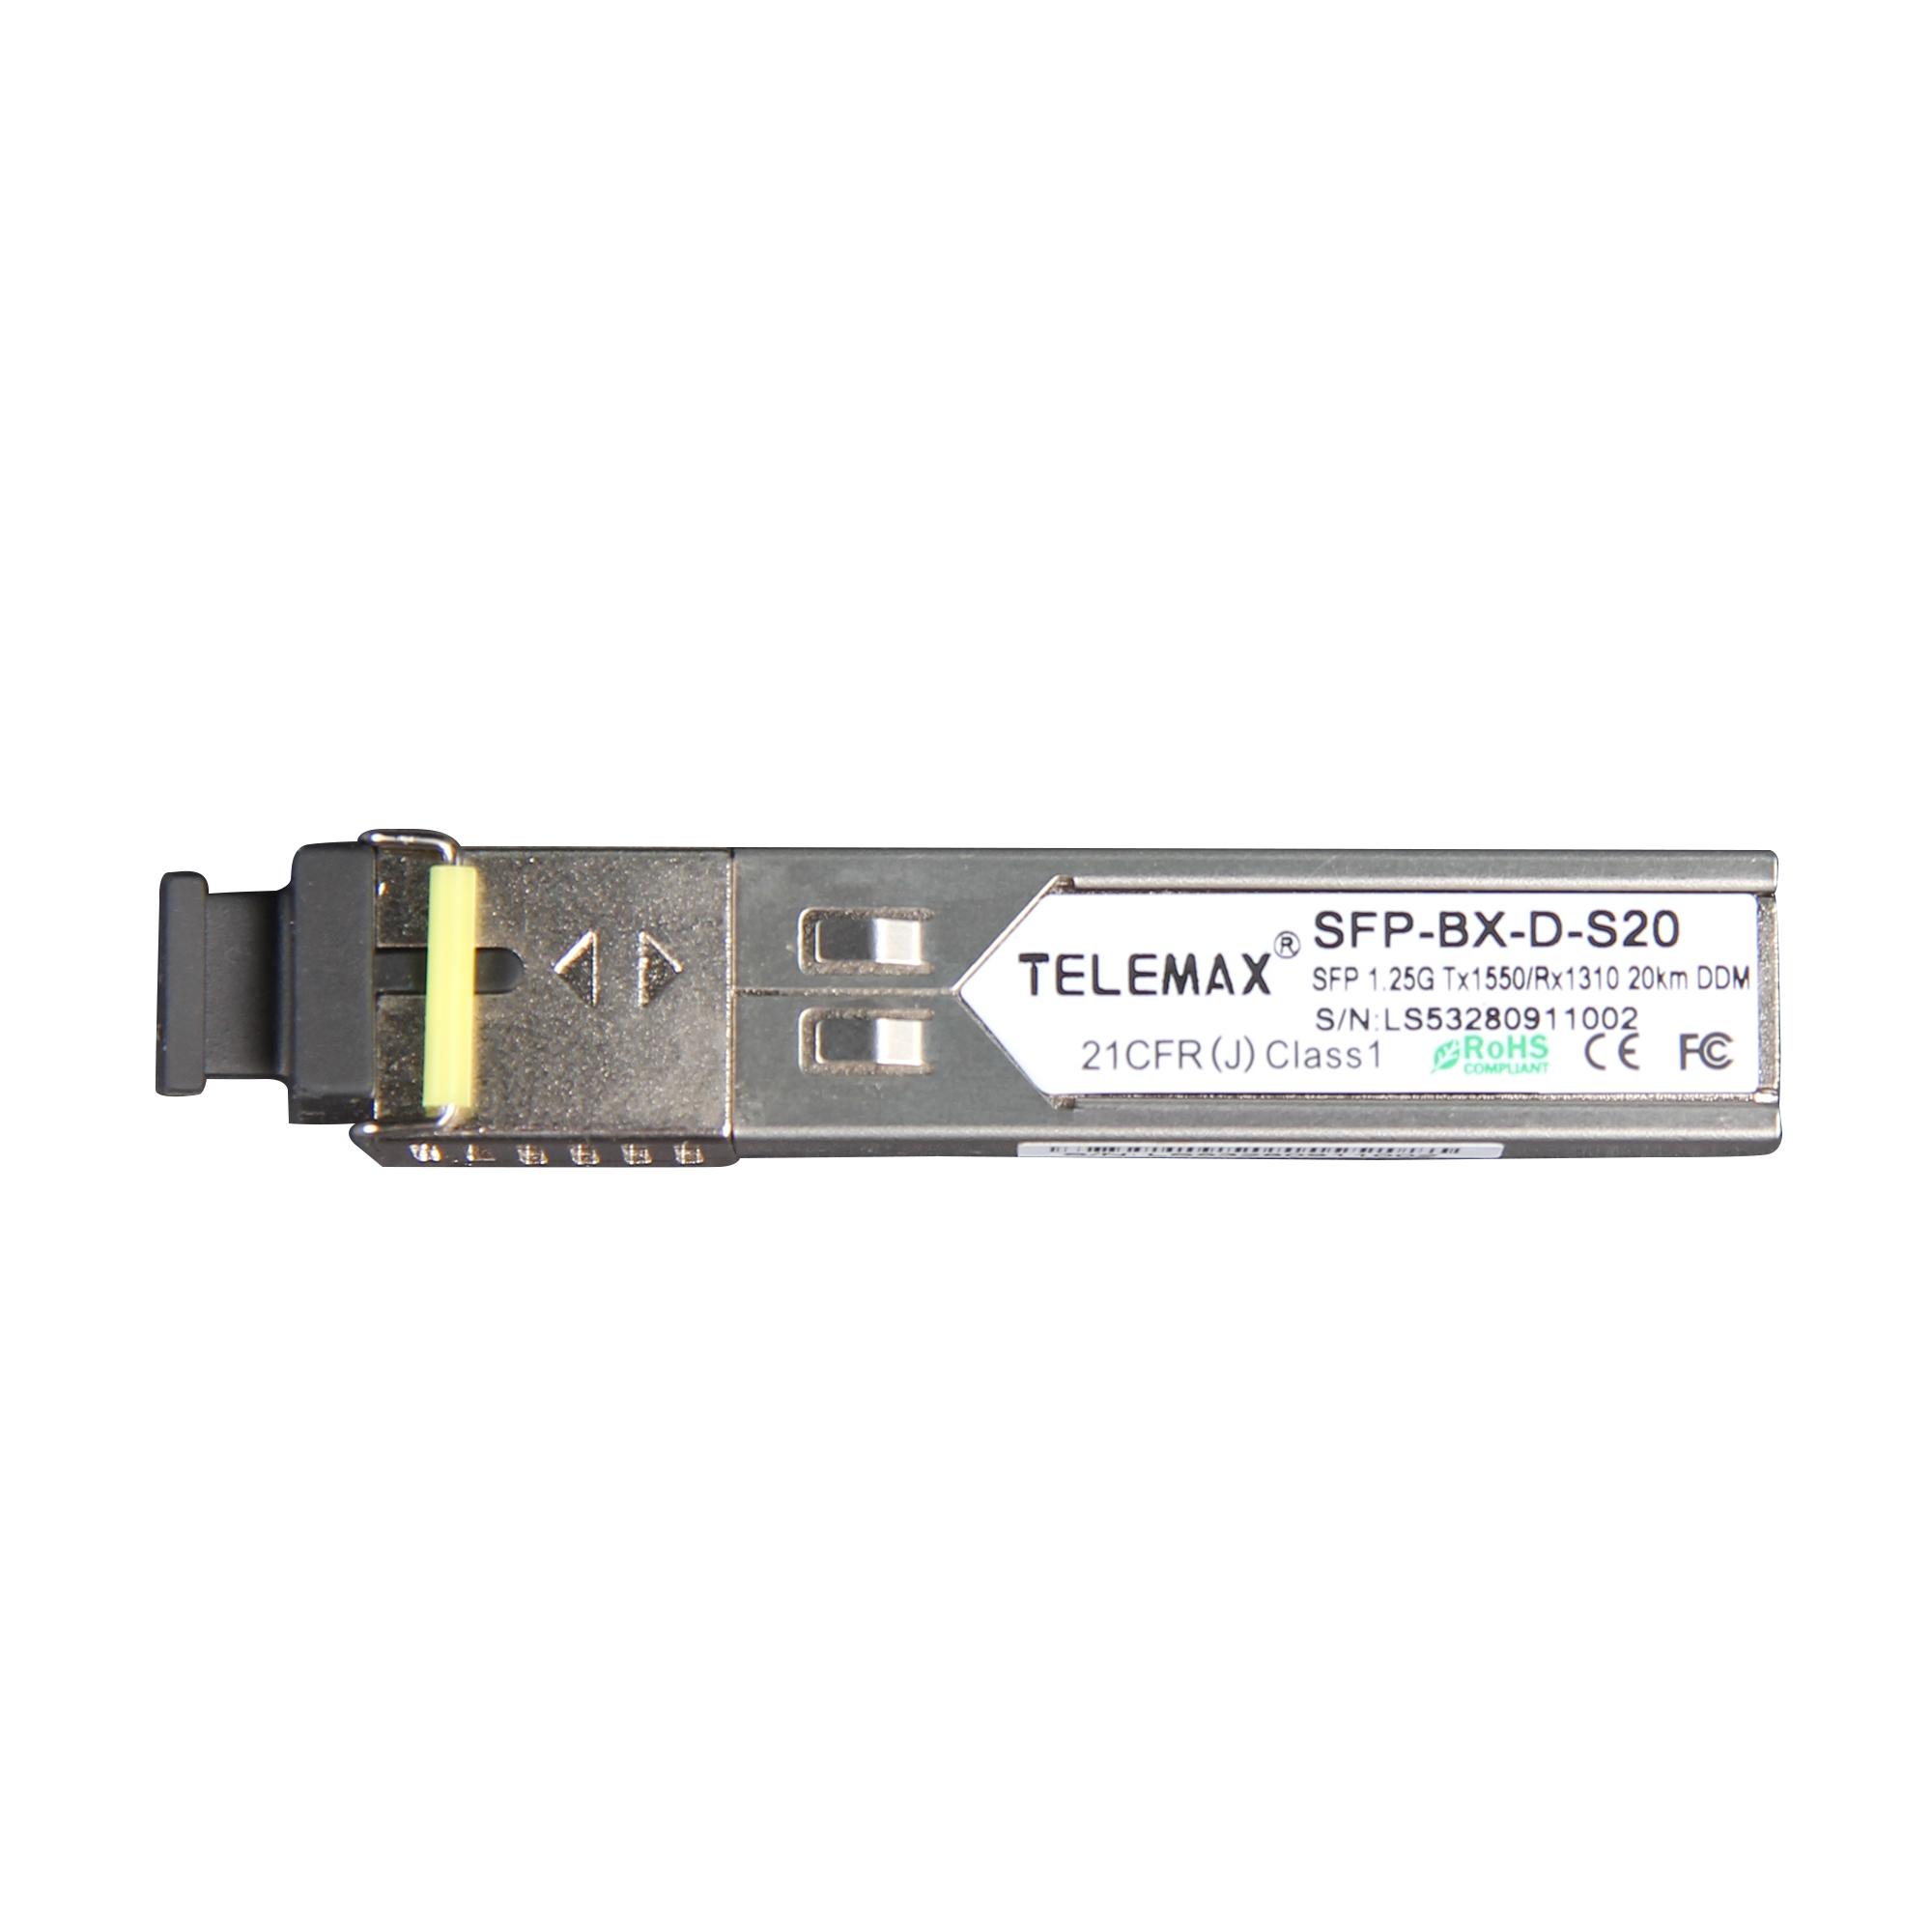 SFP 1.25G Tx1550/Rx1310 SC Simplex 20km DDM